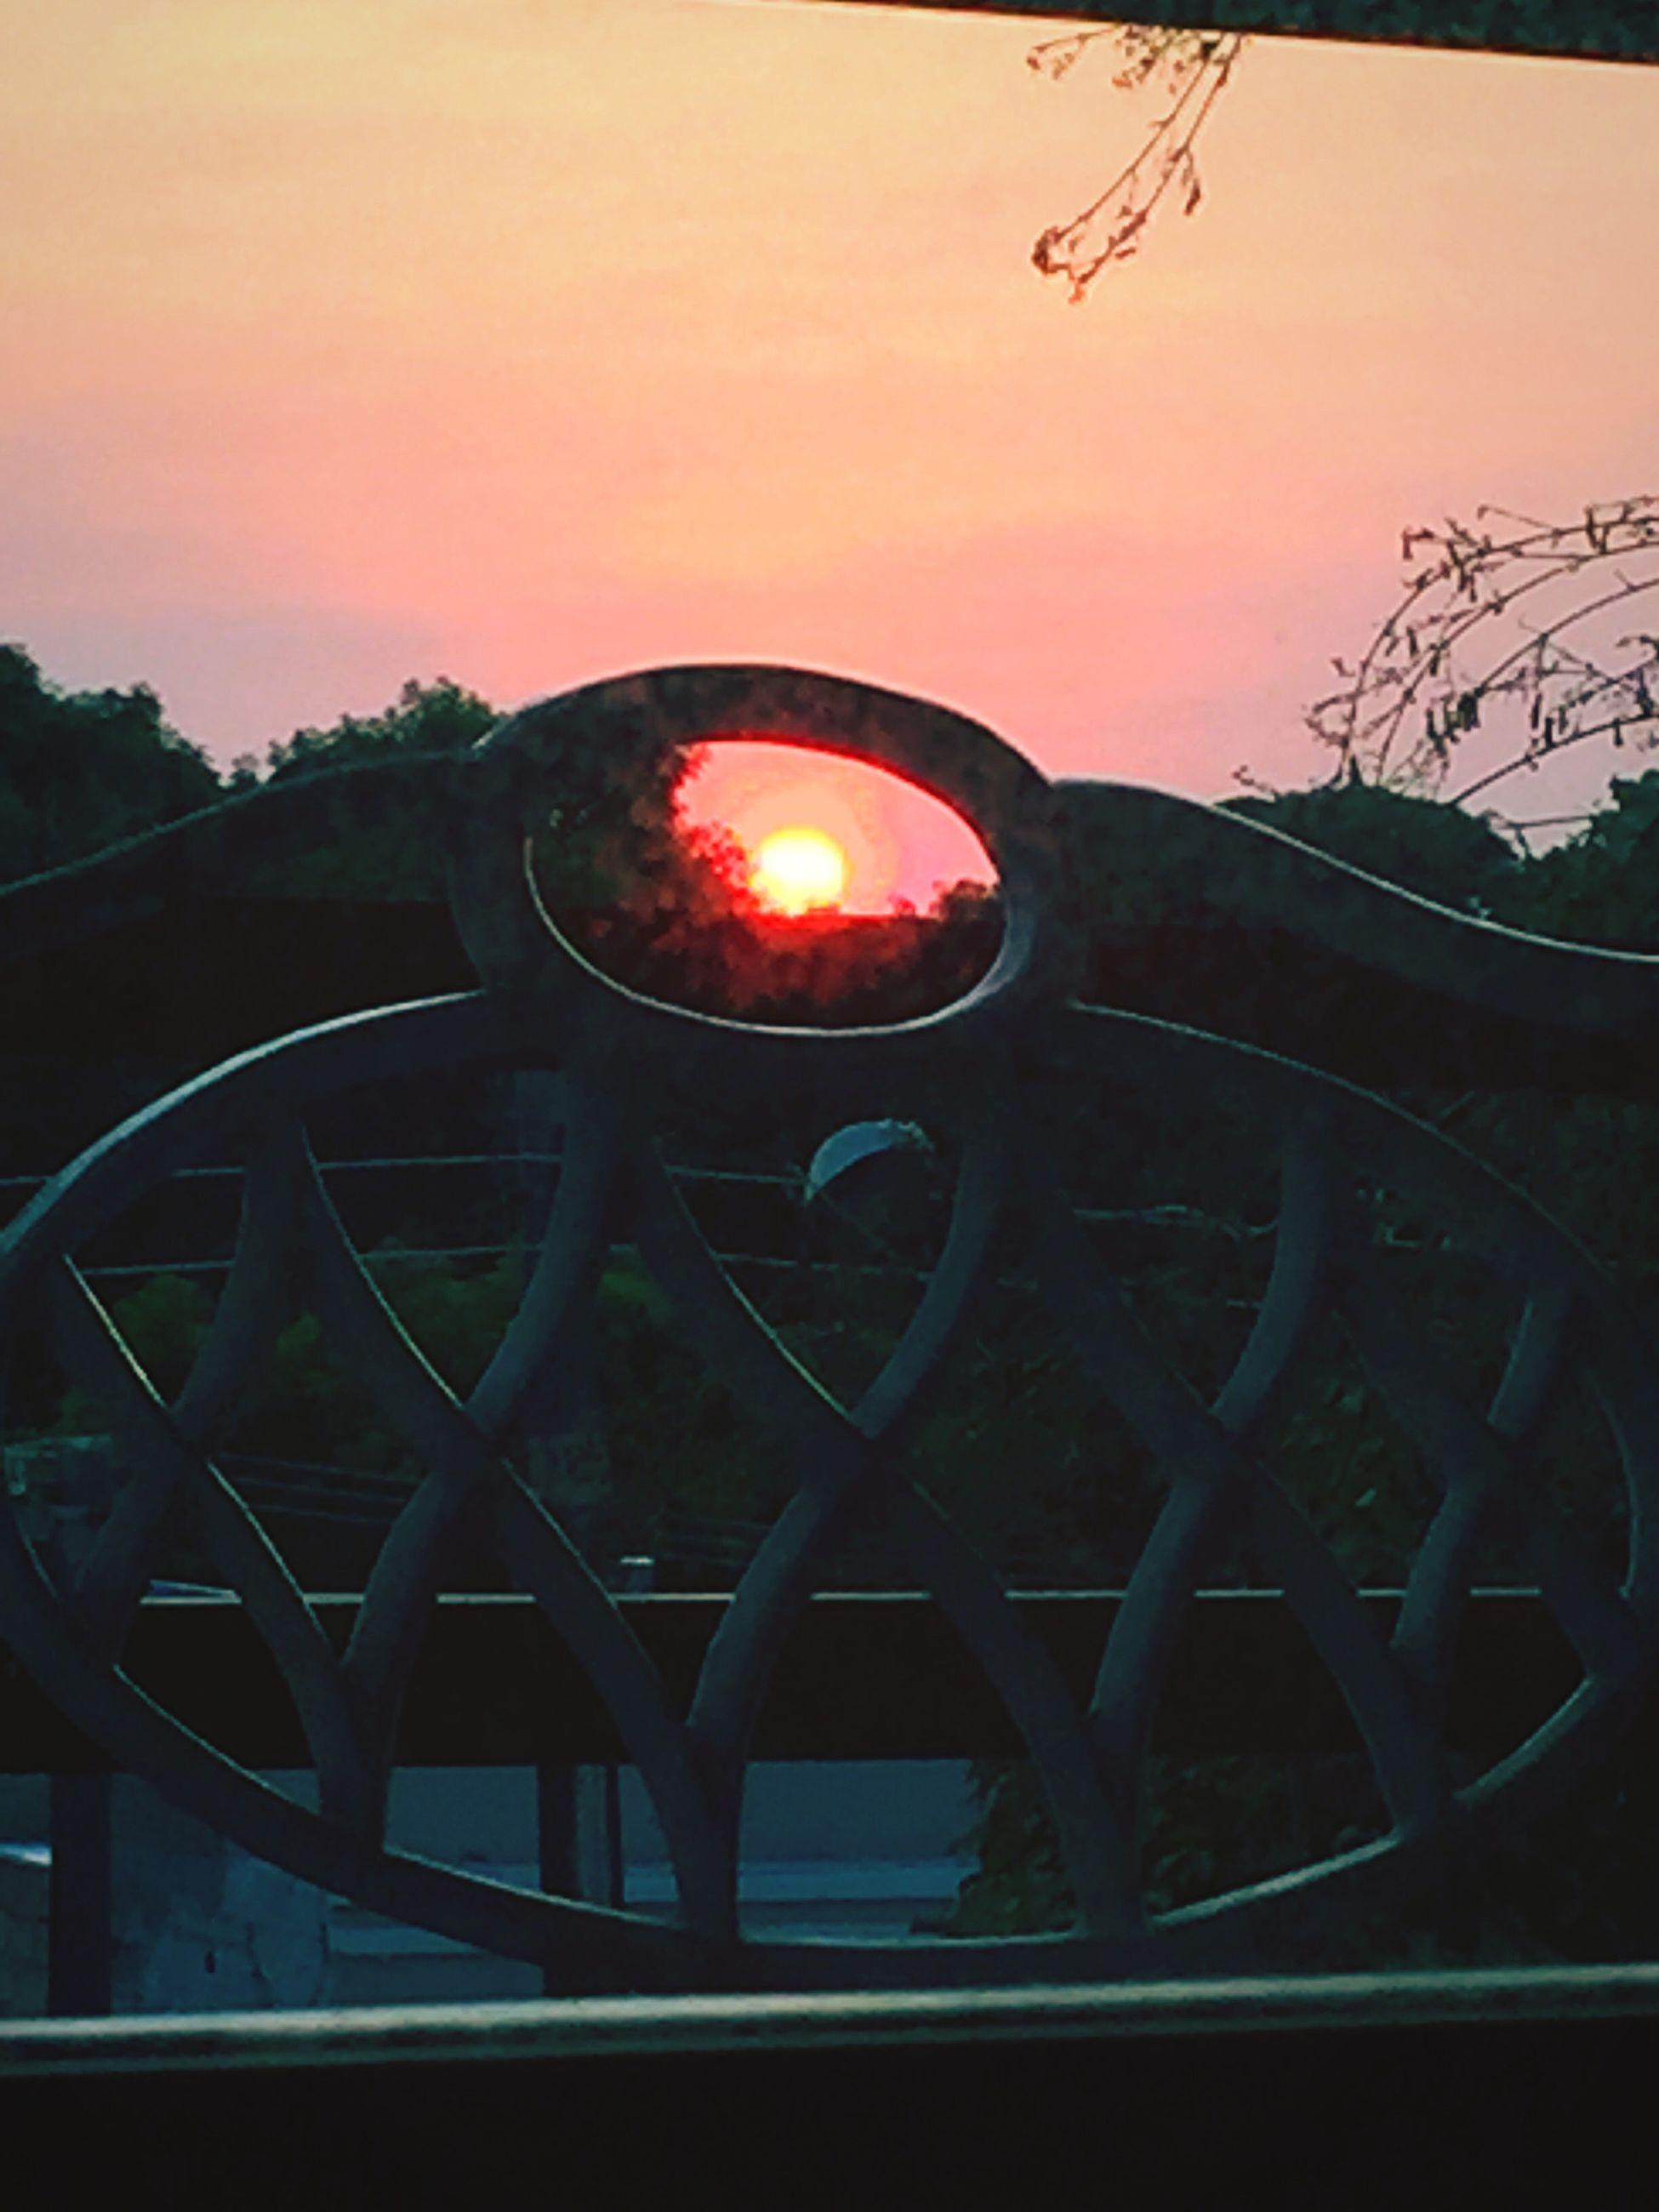 sunset, illuminated, orange color, sky, sun, silhouette, transportation, lighting equipment, circle, glowing, tree, connection, street light, no people, outdoors, night, built structure, metal, bridge - man made structure, railing